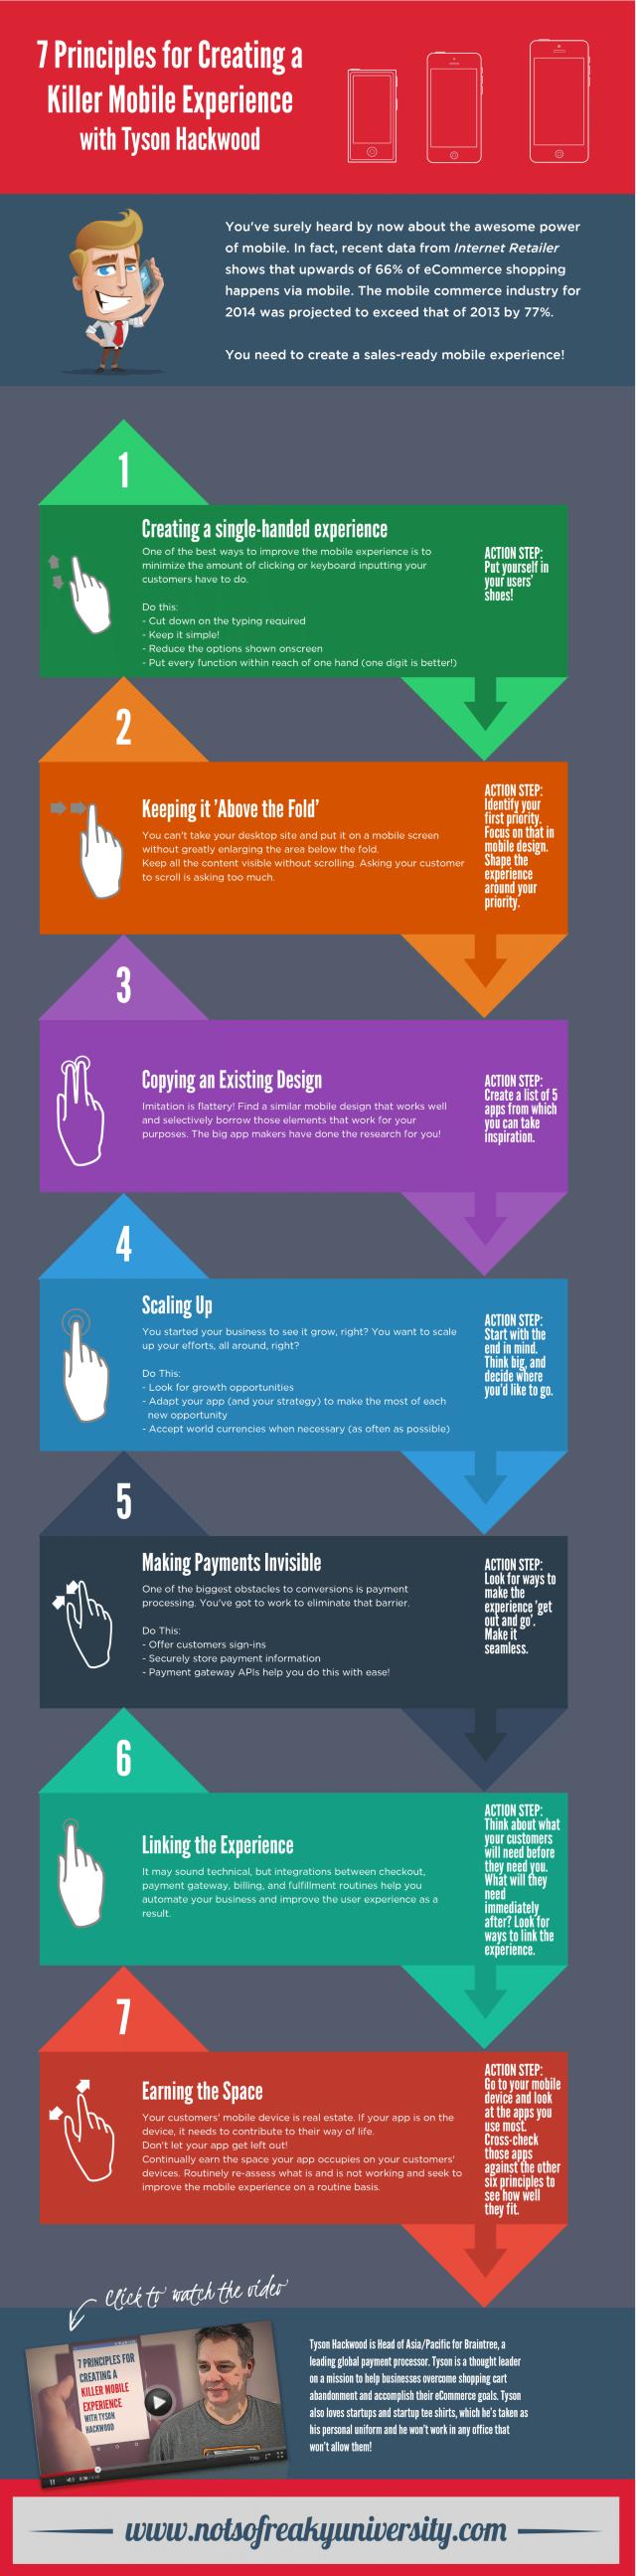 tyson hackwood infographic 640w